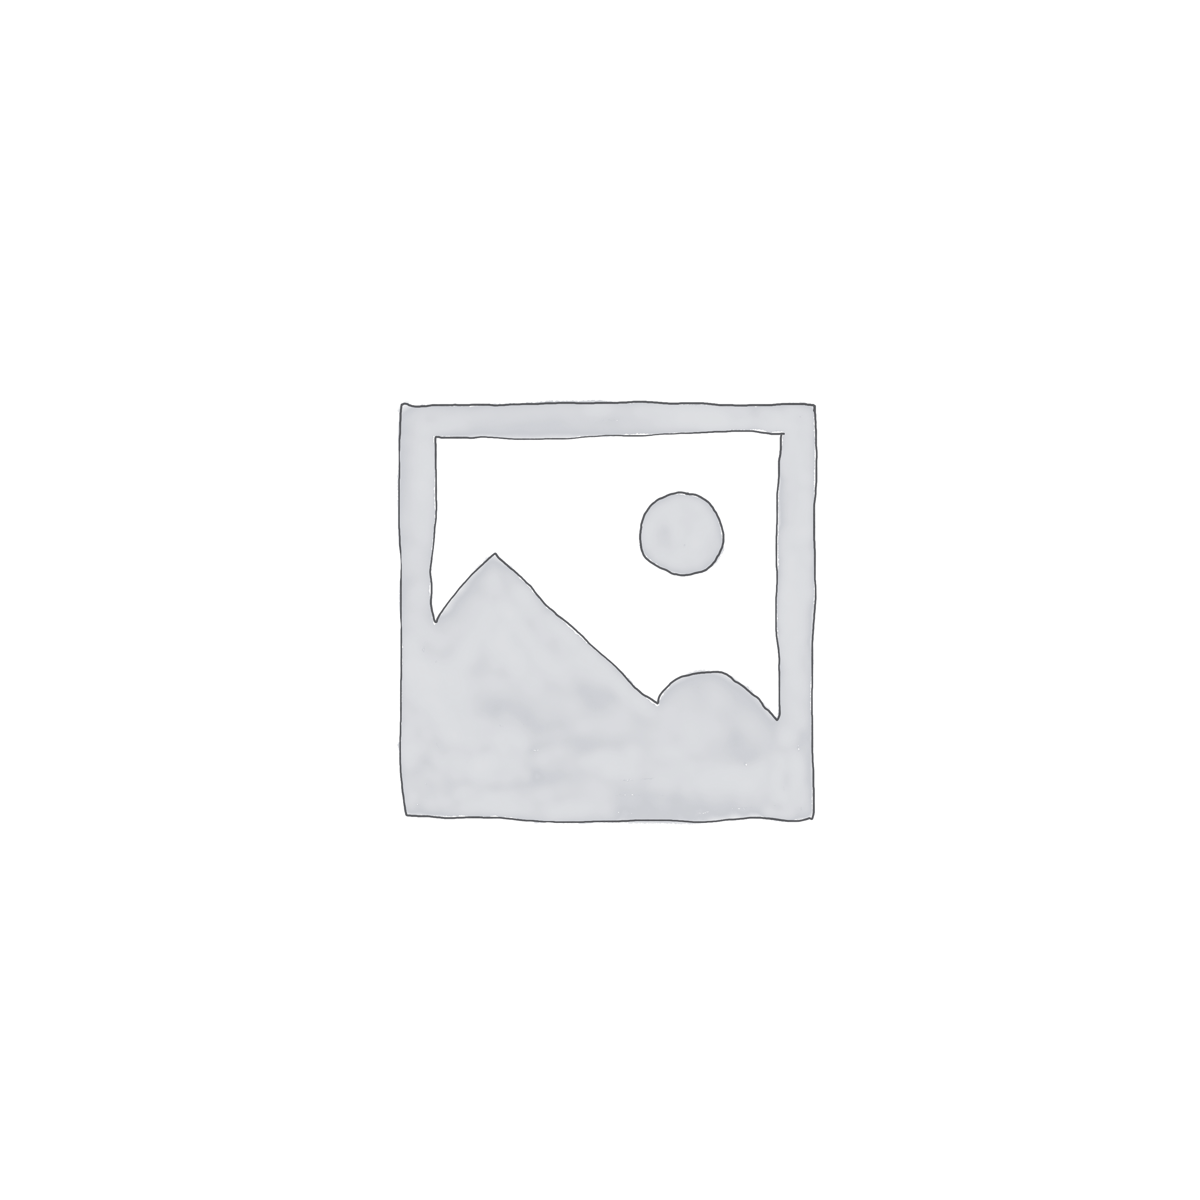 REFLEX GUL 69×31,5 ASPÖCK